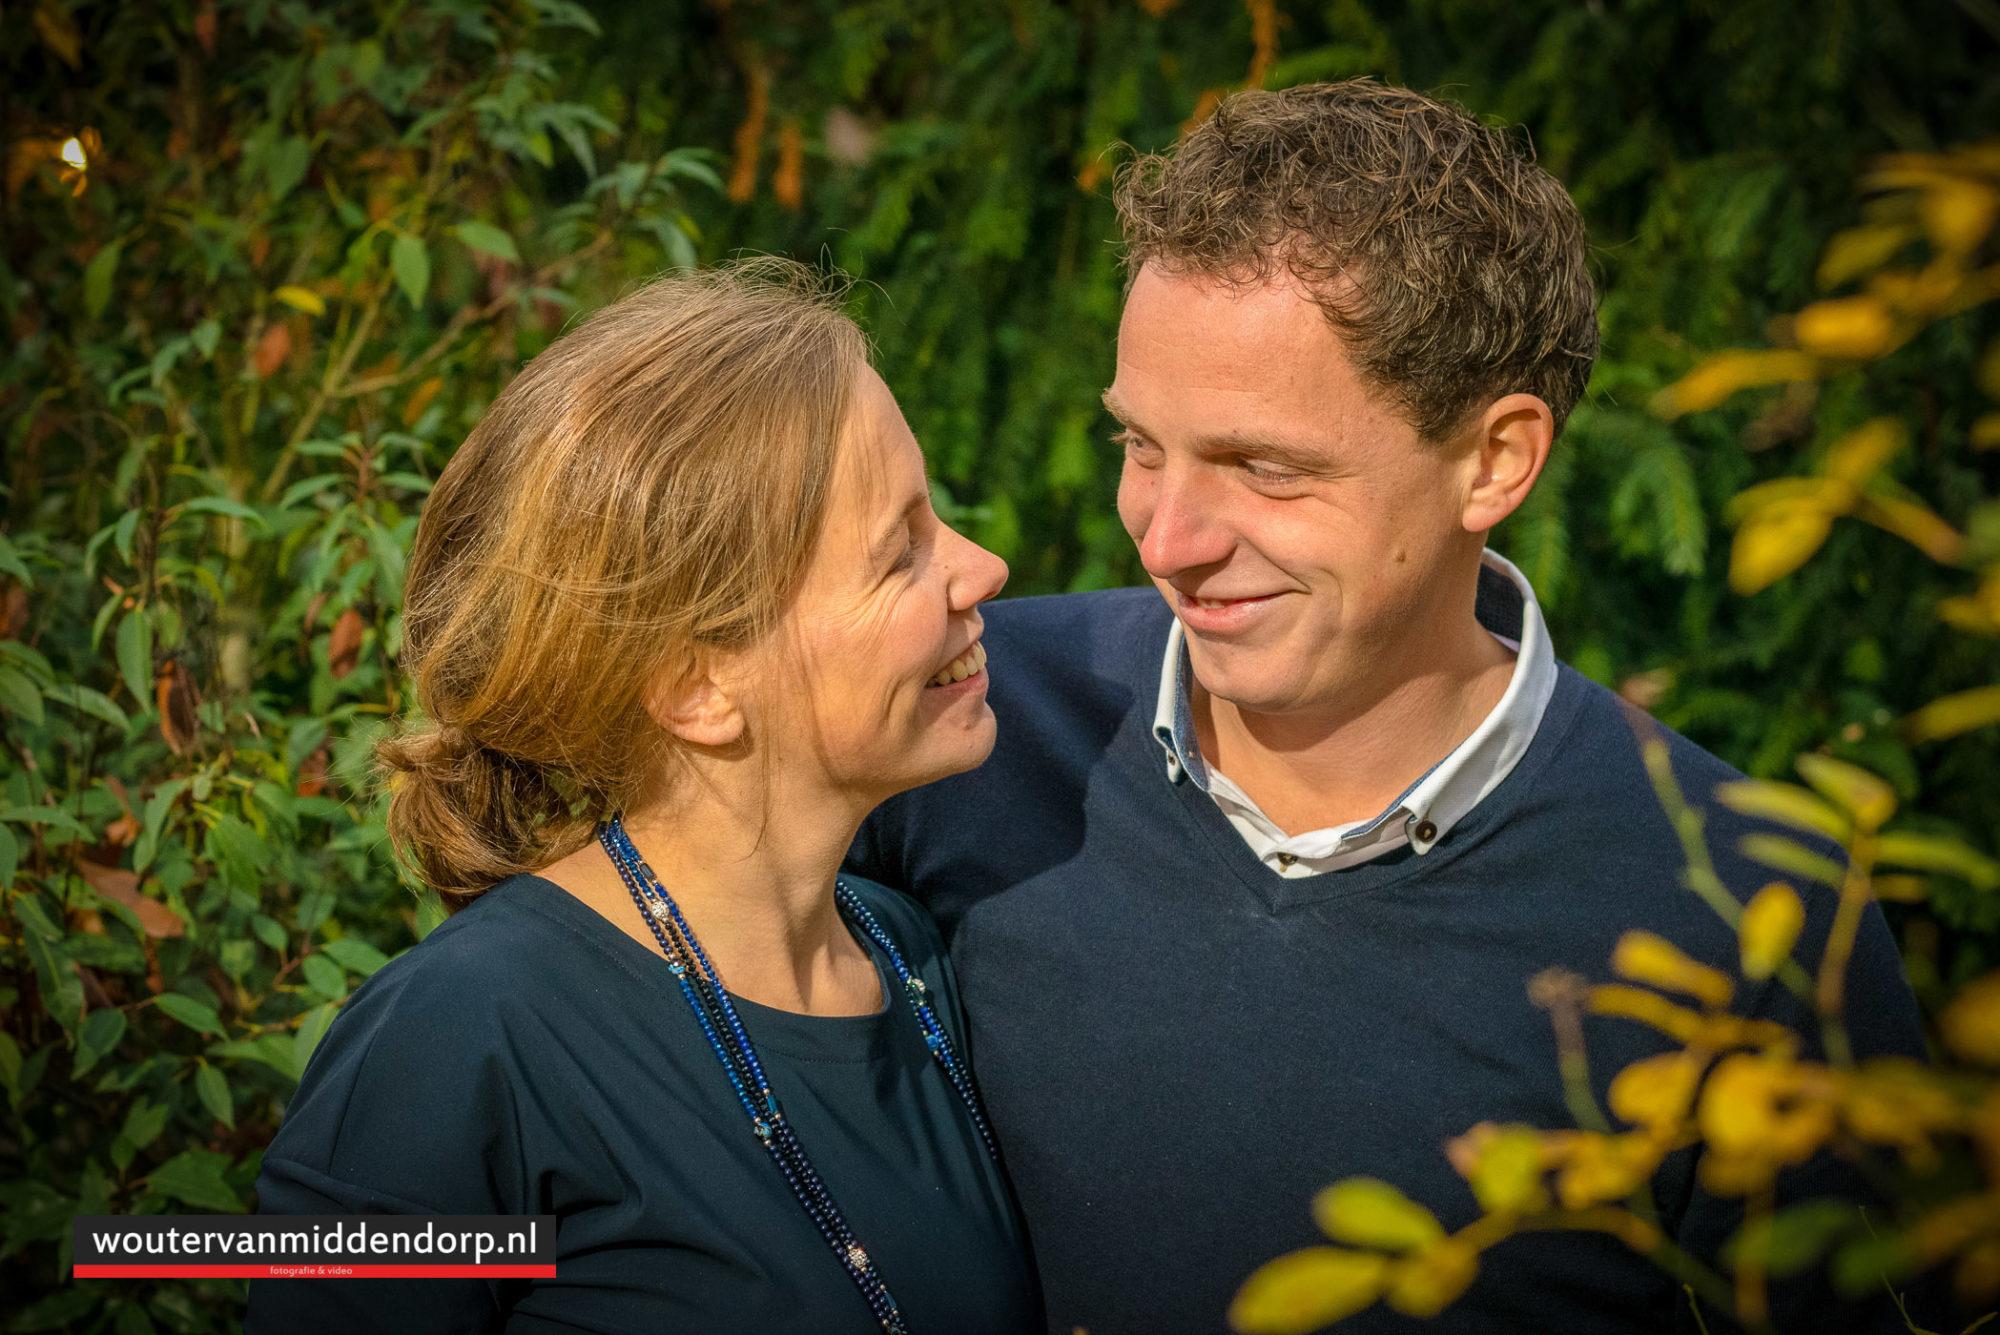 fotograaf Wouter van Middendorp Nunspeet-9